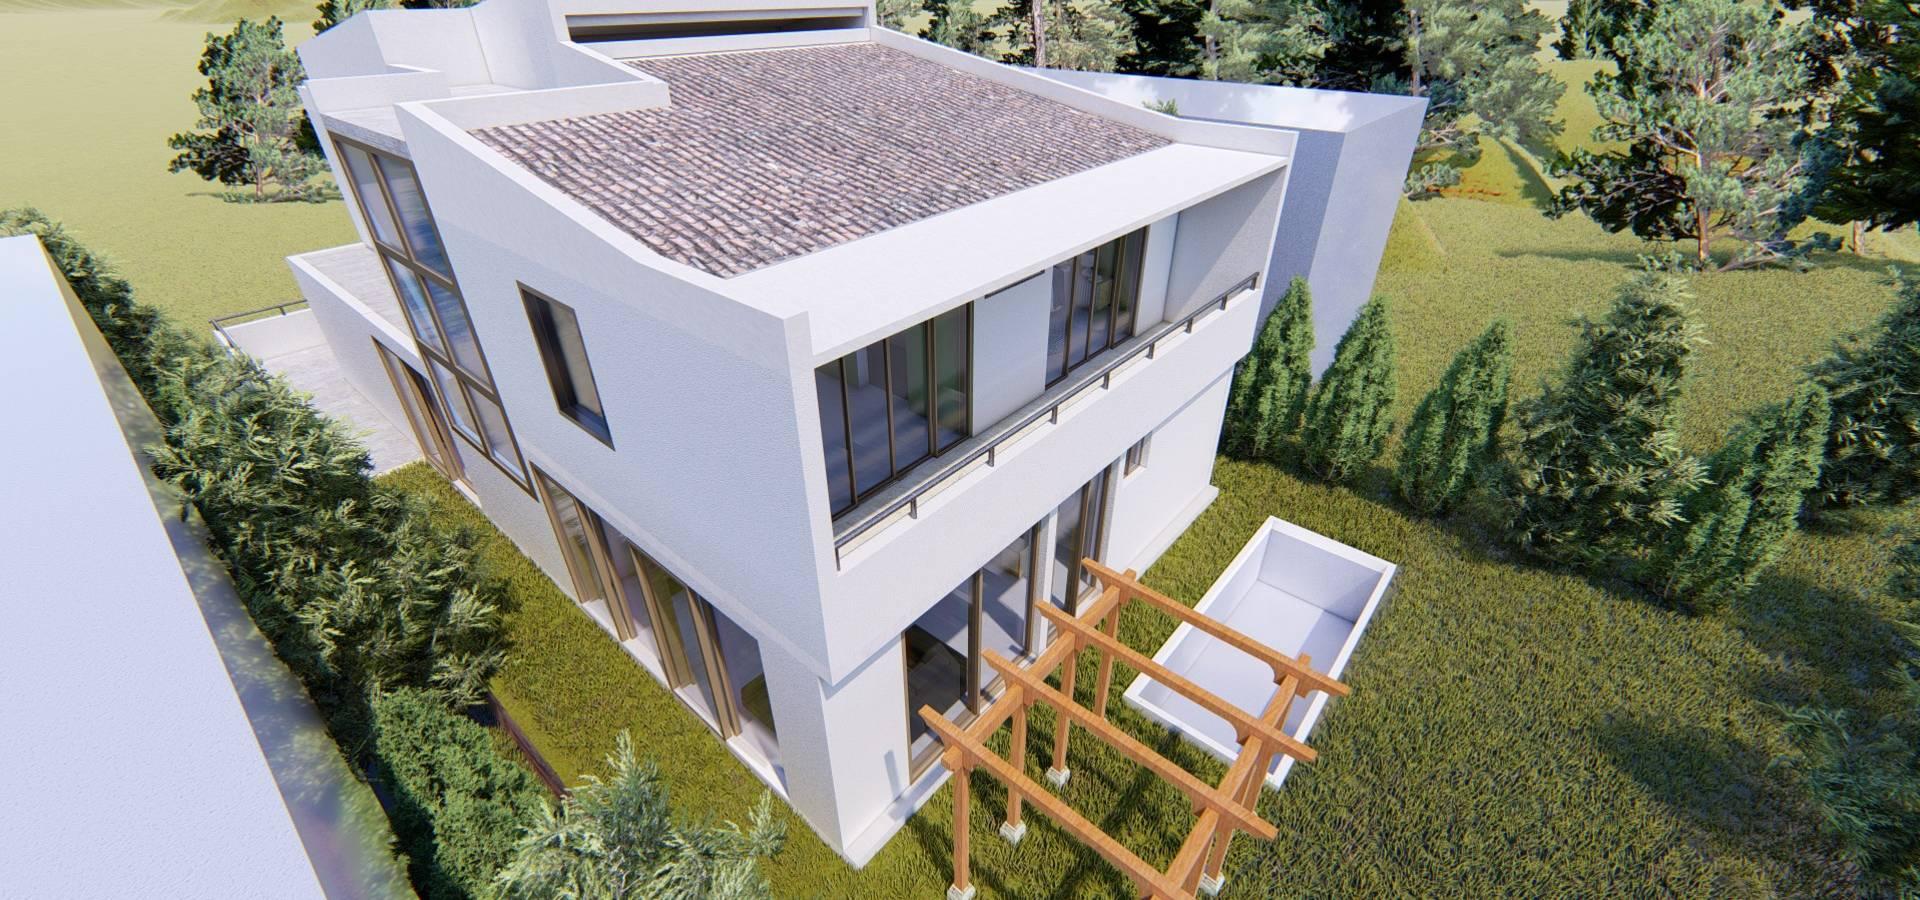 Dubrovsky Arquitectura